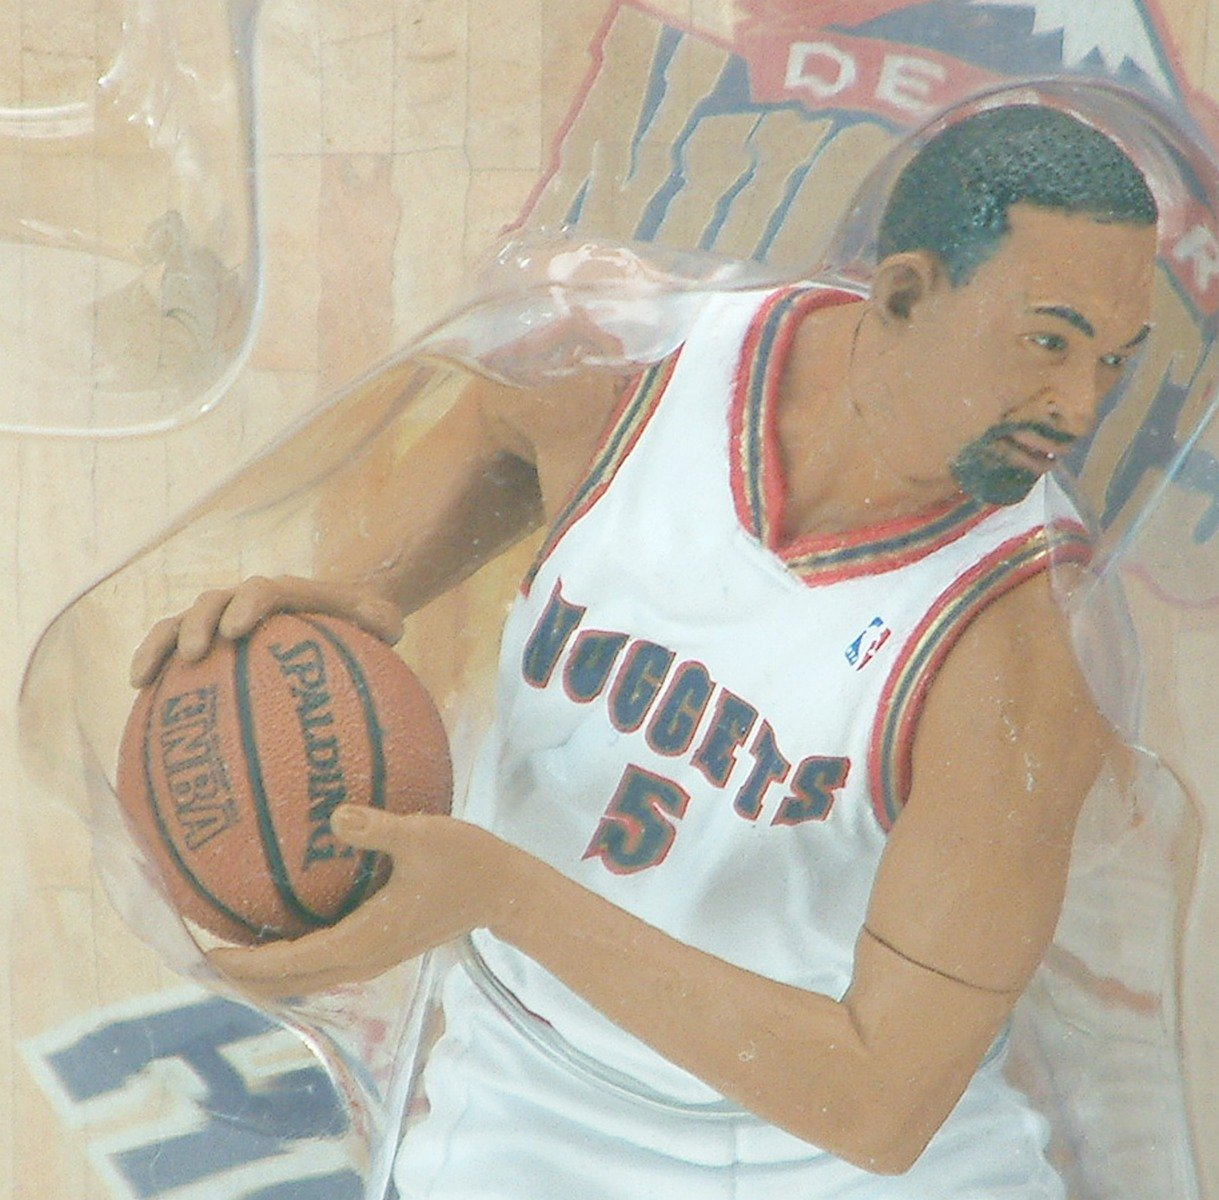 NBA Series 3 Juwan Howard McFarlane Sportspicks Action Figure Chase Variant